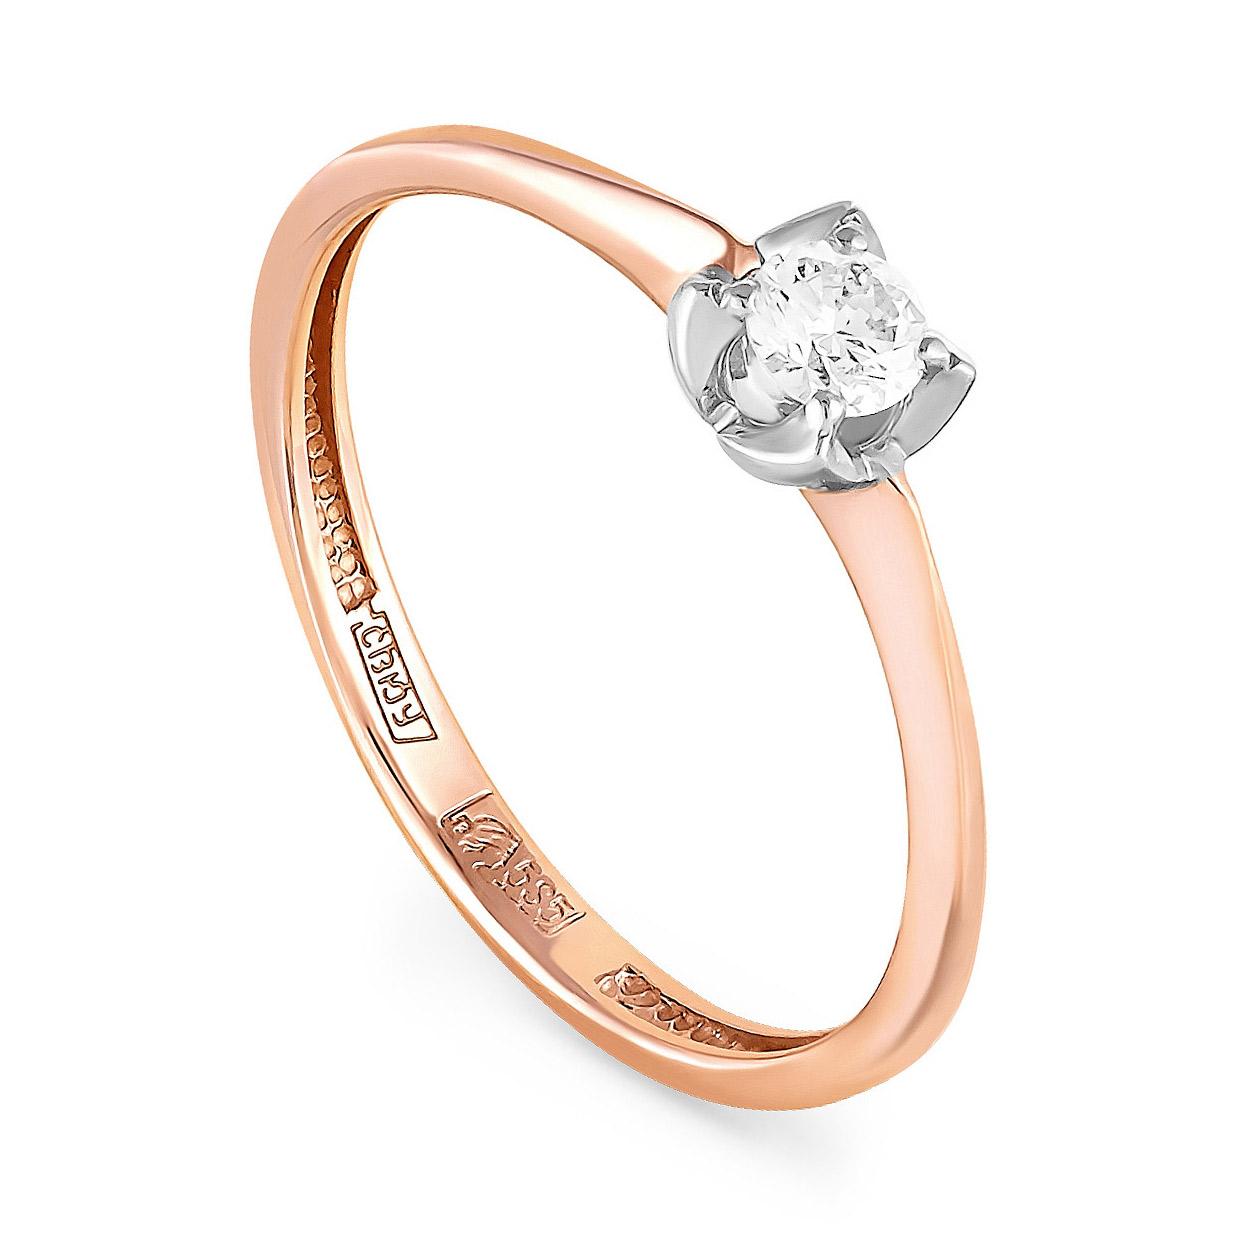 Золотое кольцо Бриллиант арт. 11-0810-1000 11-0810-1000